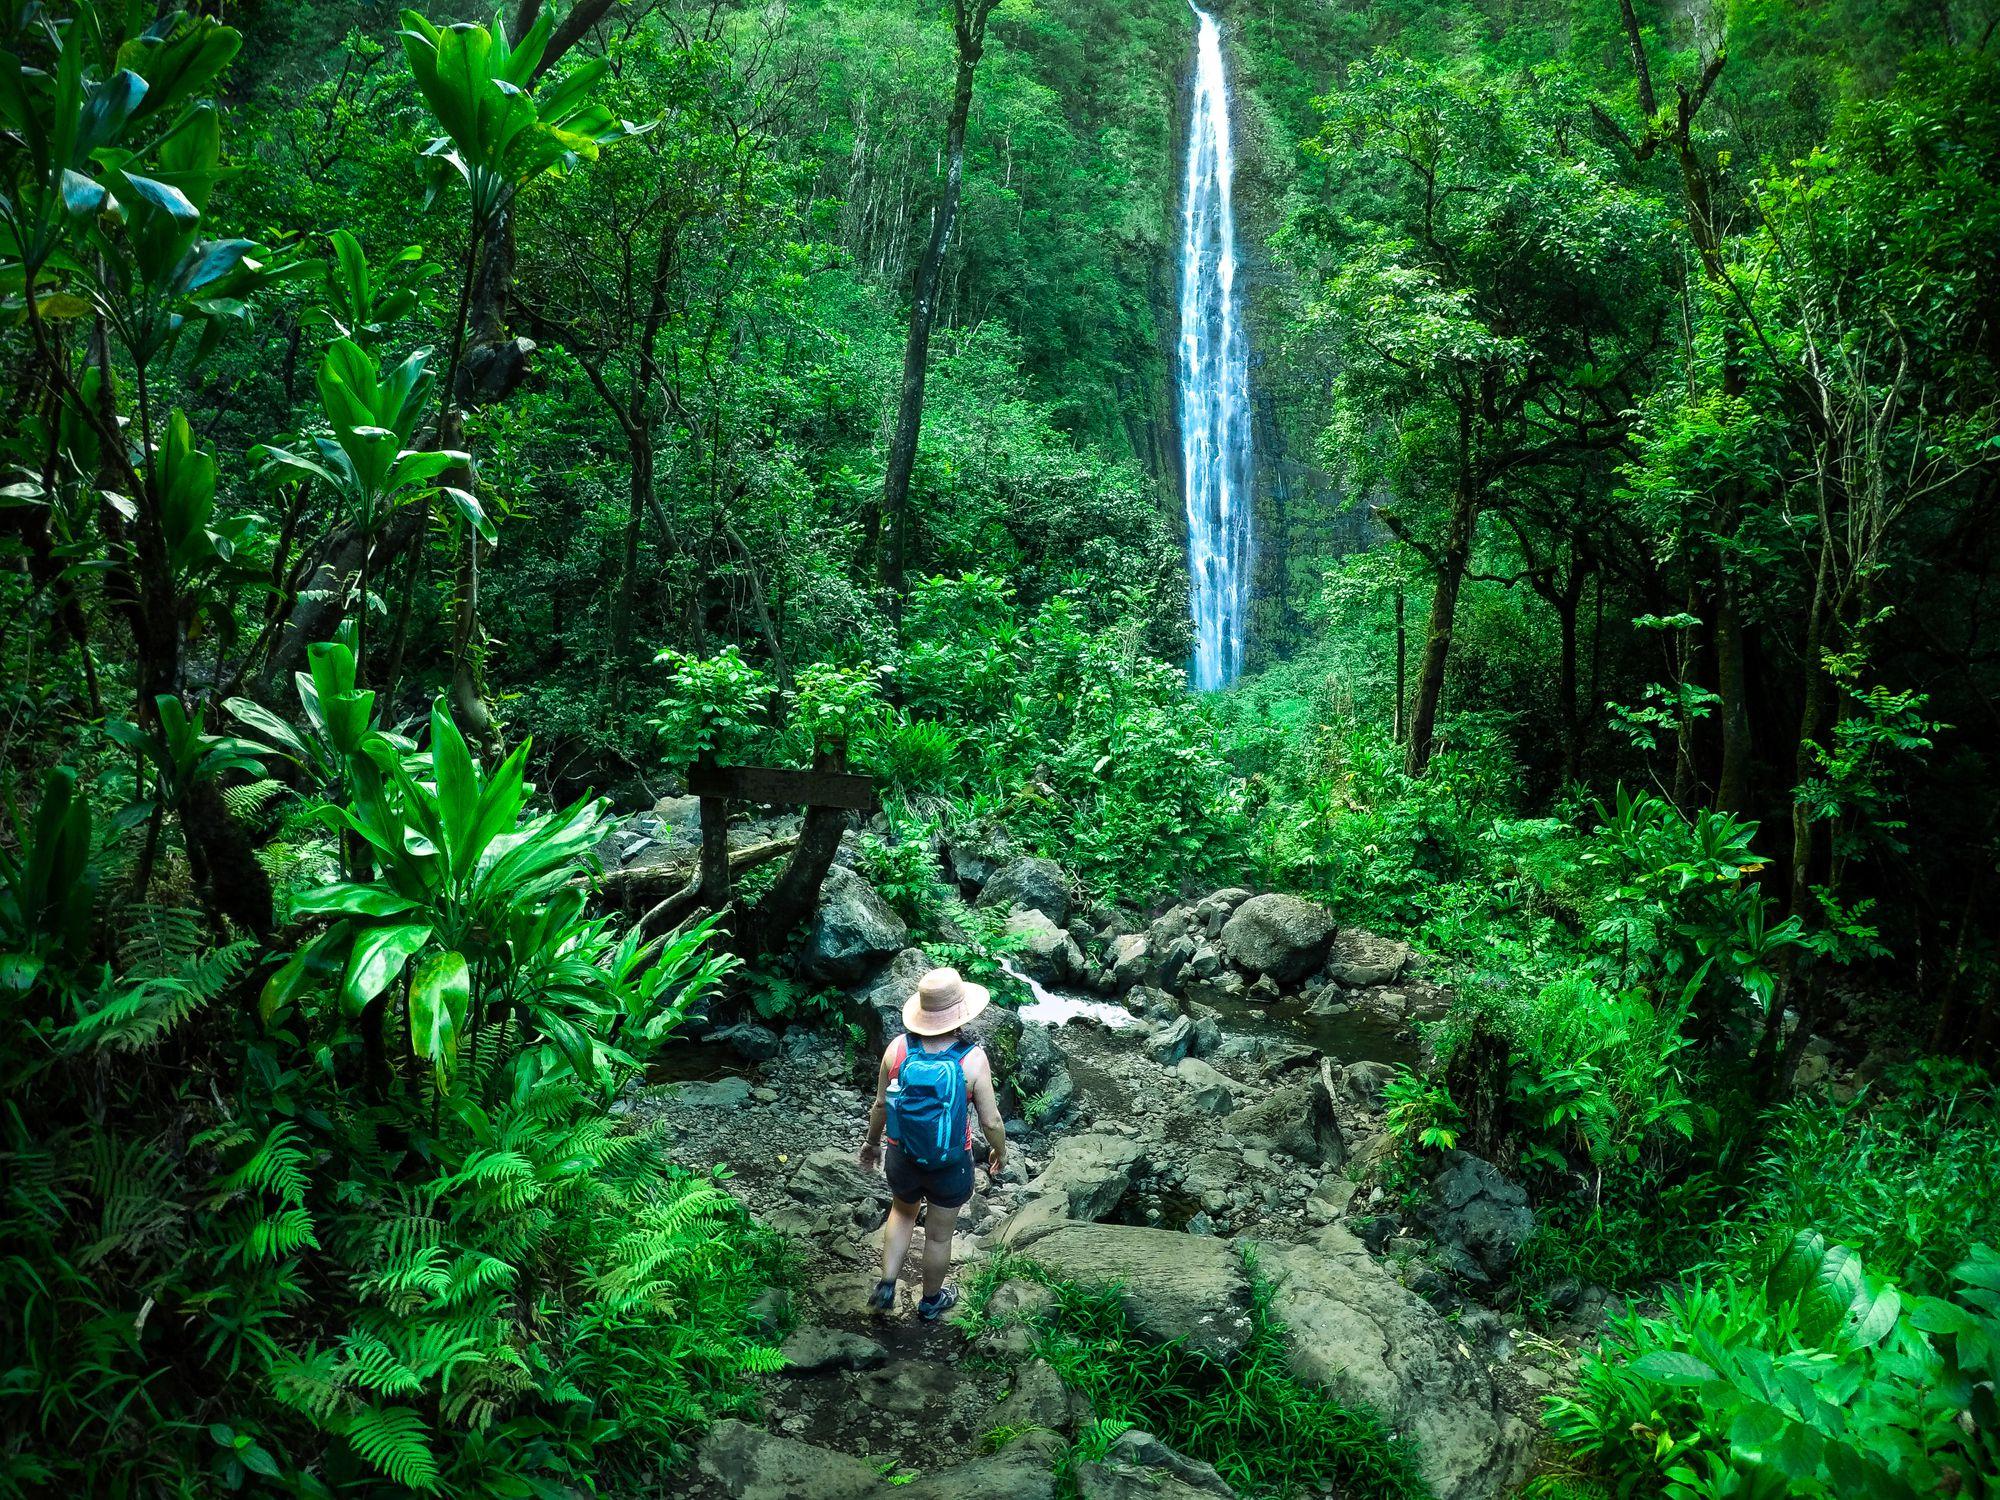 Woman hiking towards a waterfall, Maui, Hawaii, America, USA